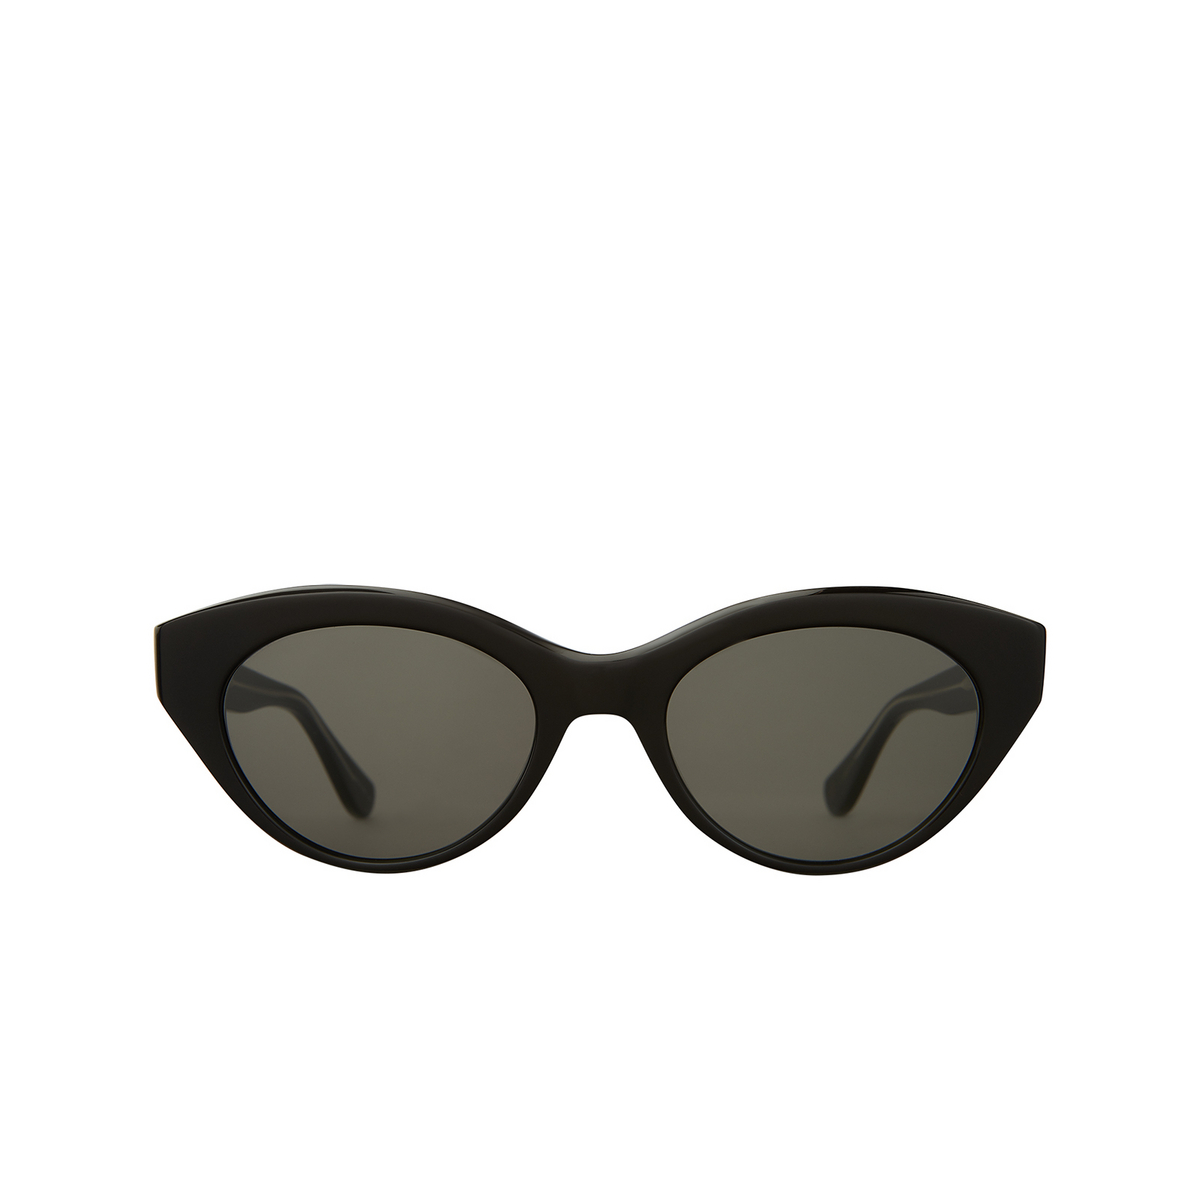 Garrett Leight® Cat-eye Sunglasses: Juvee Sun color Black Bk/gry.